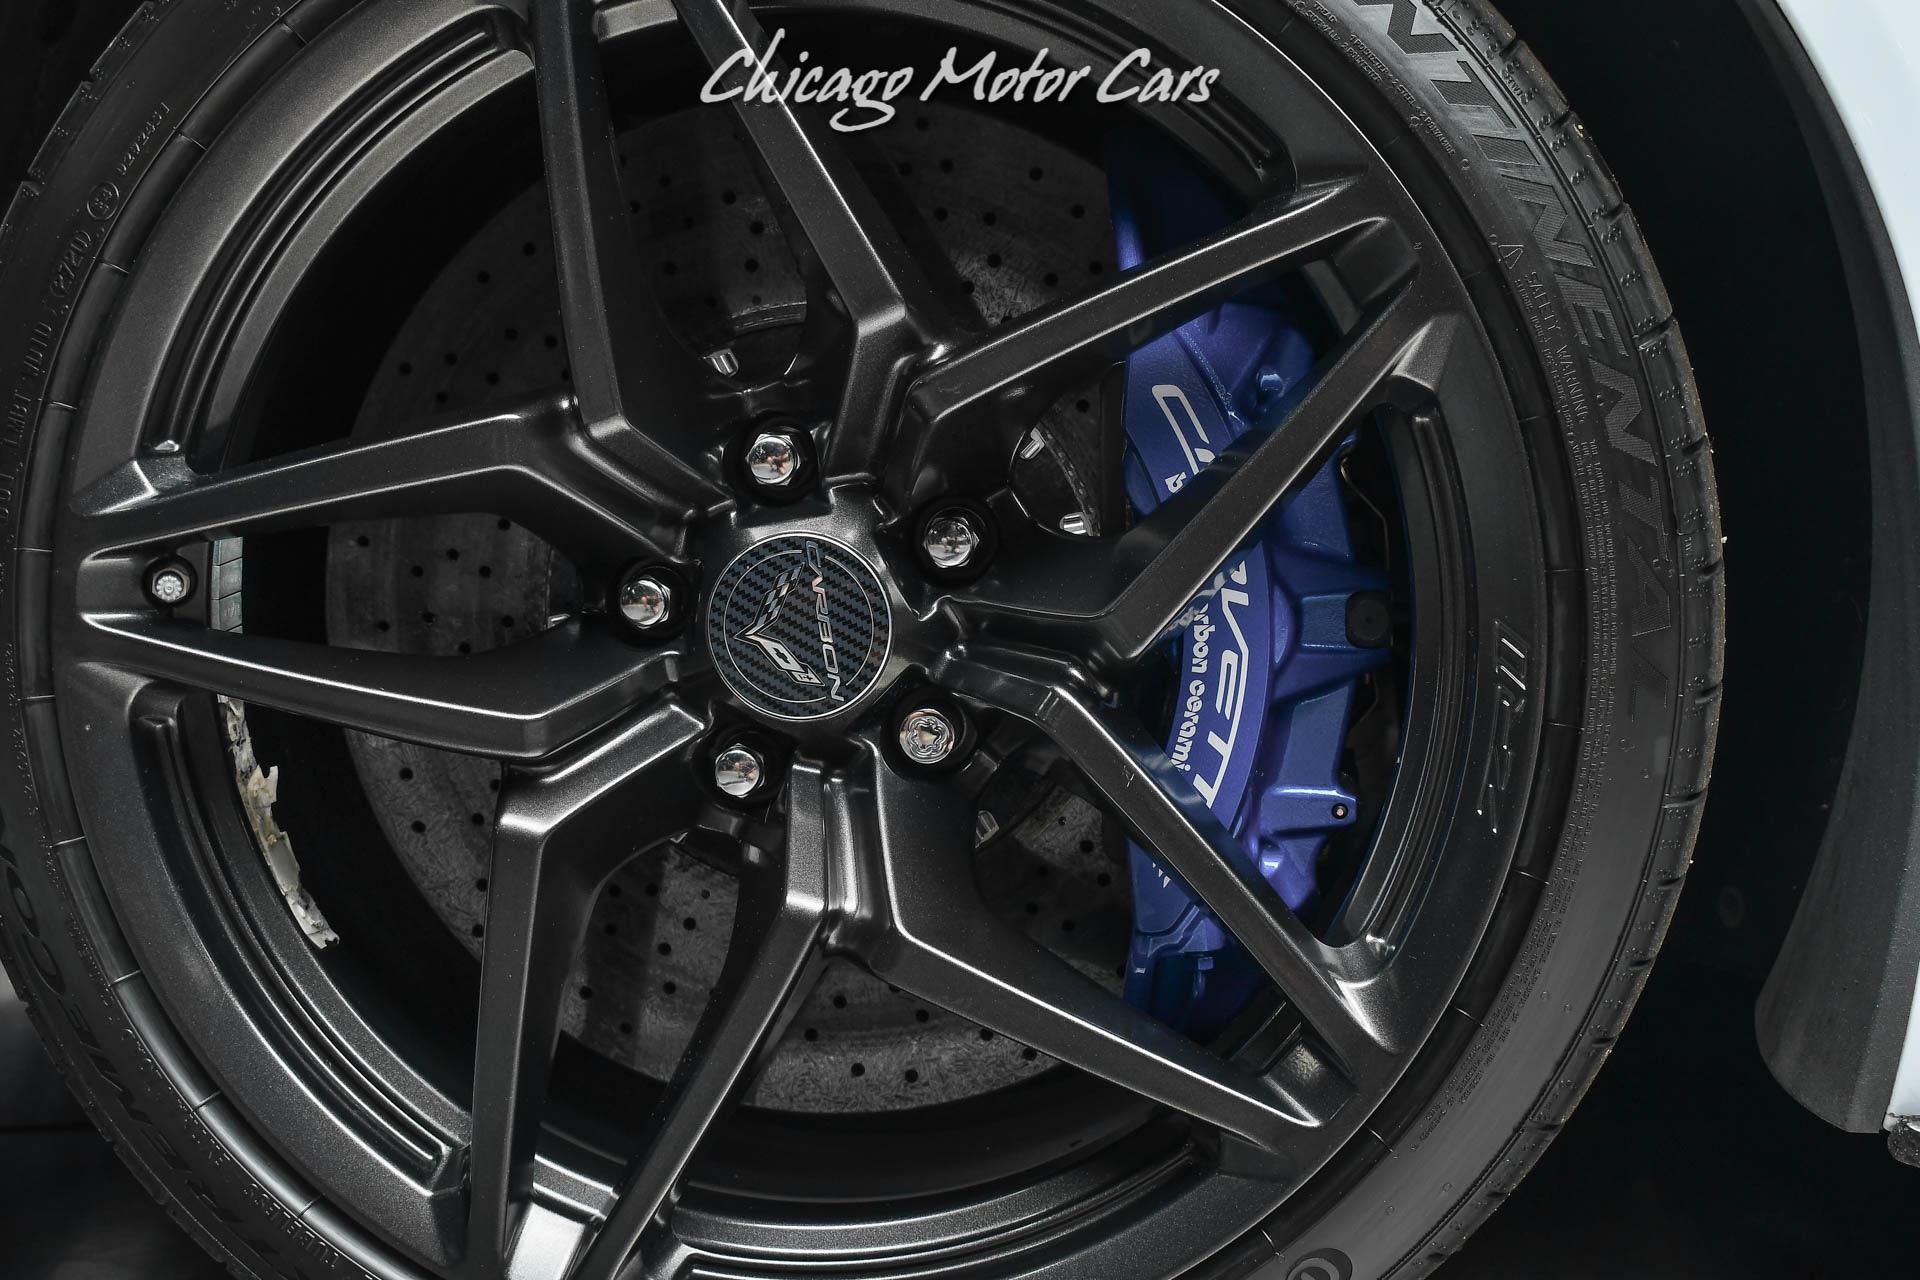 Used-2019-Chevrolet-Corvette-ZR1-3ZR-MANUAL-TRANS-TRACK-PACK-RARE-SPEC